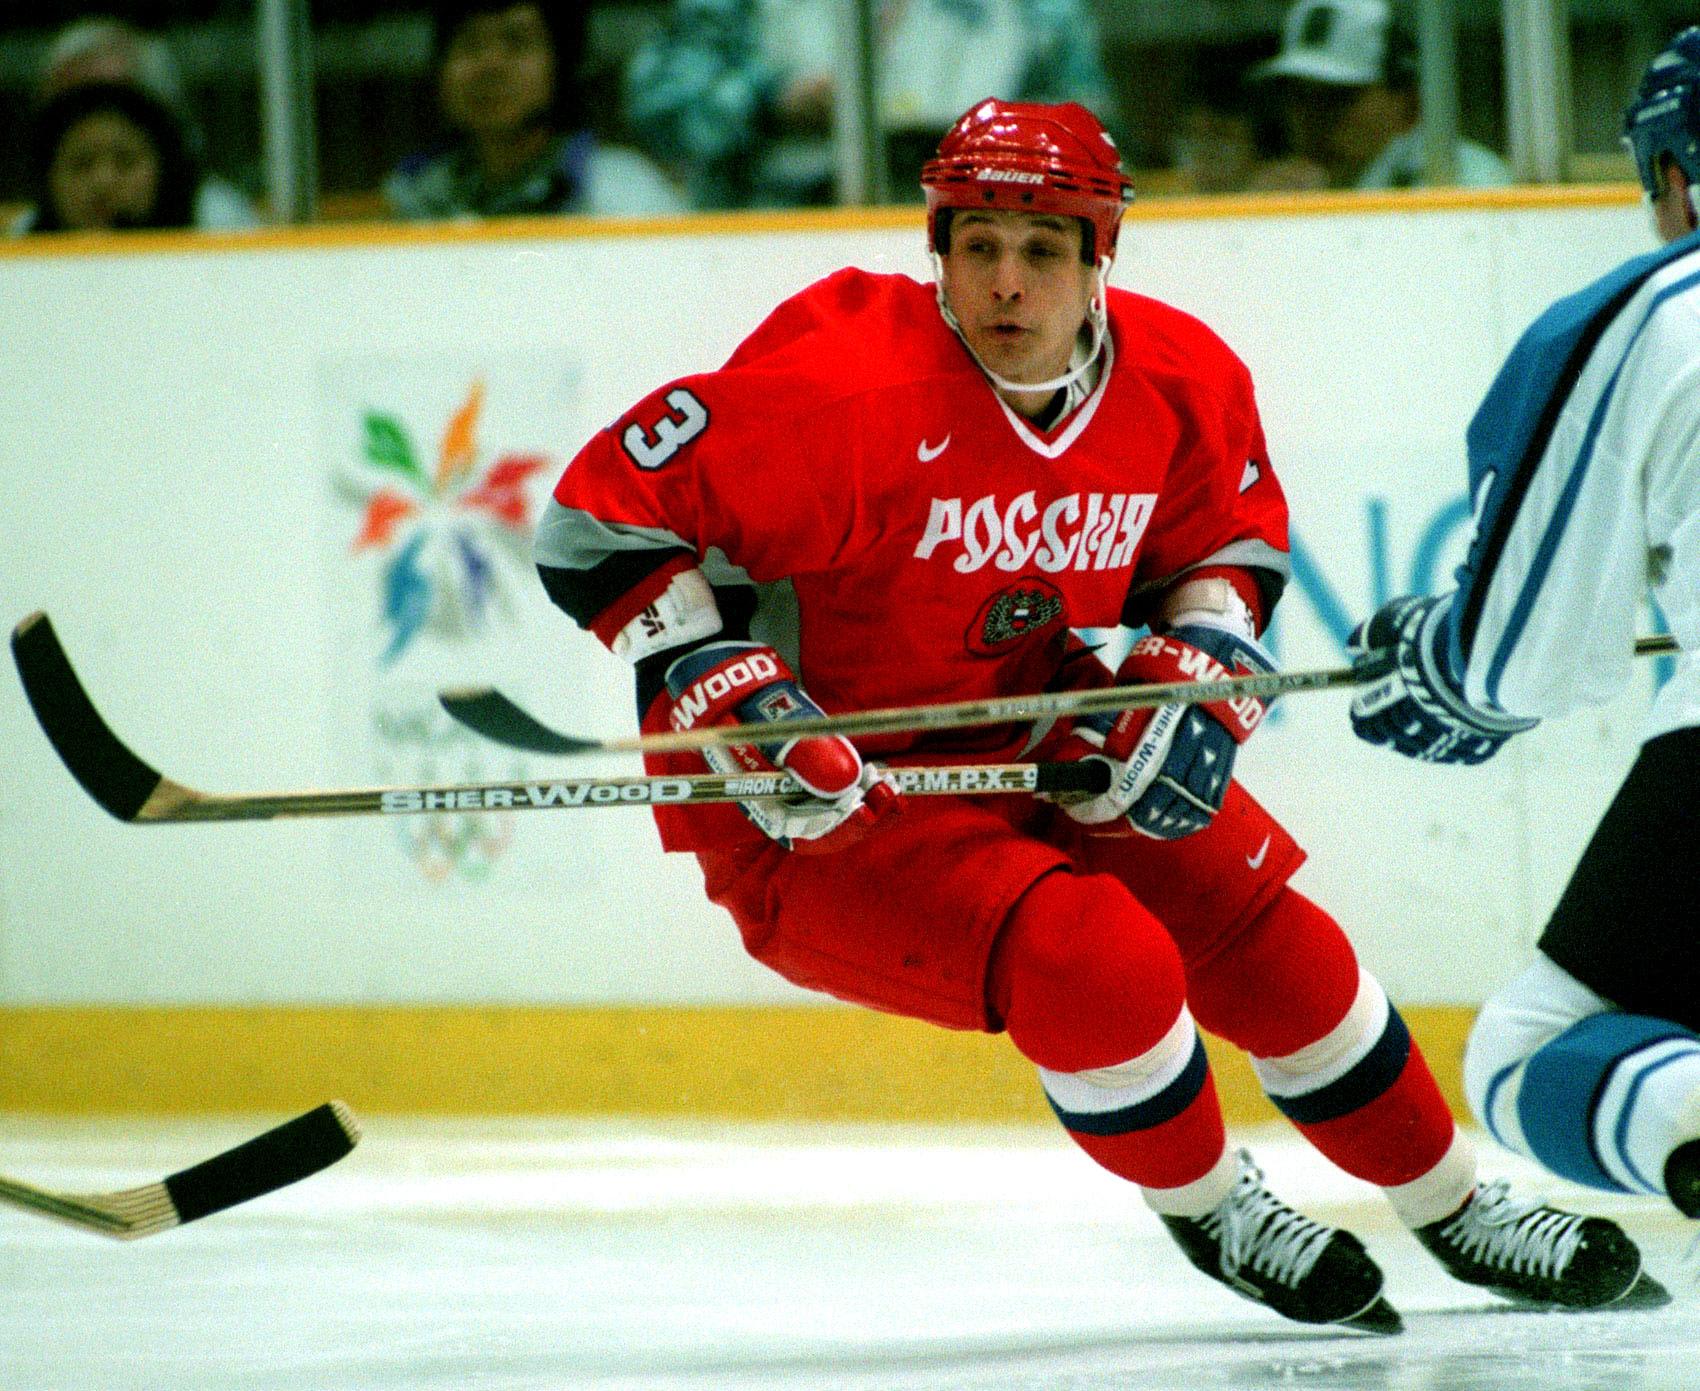 1996 - Valeri Kamenski - Russie